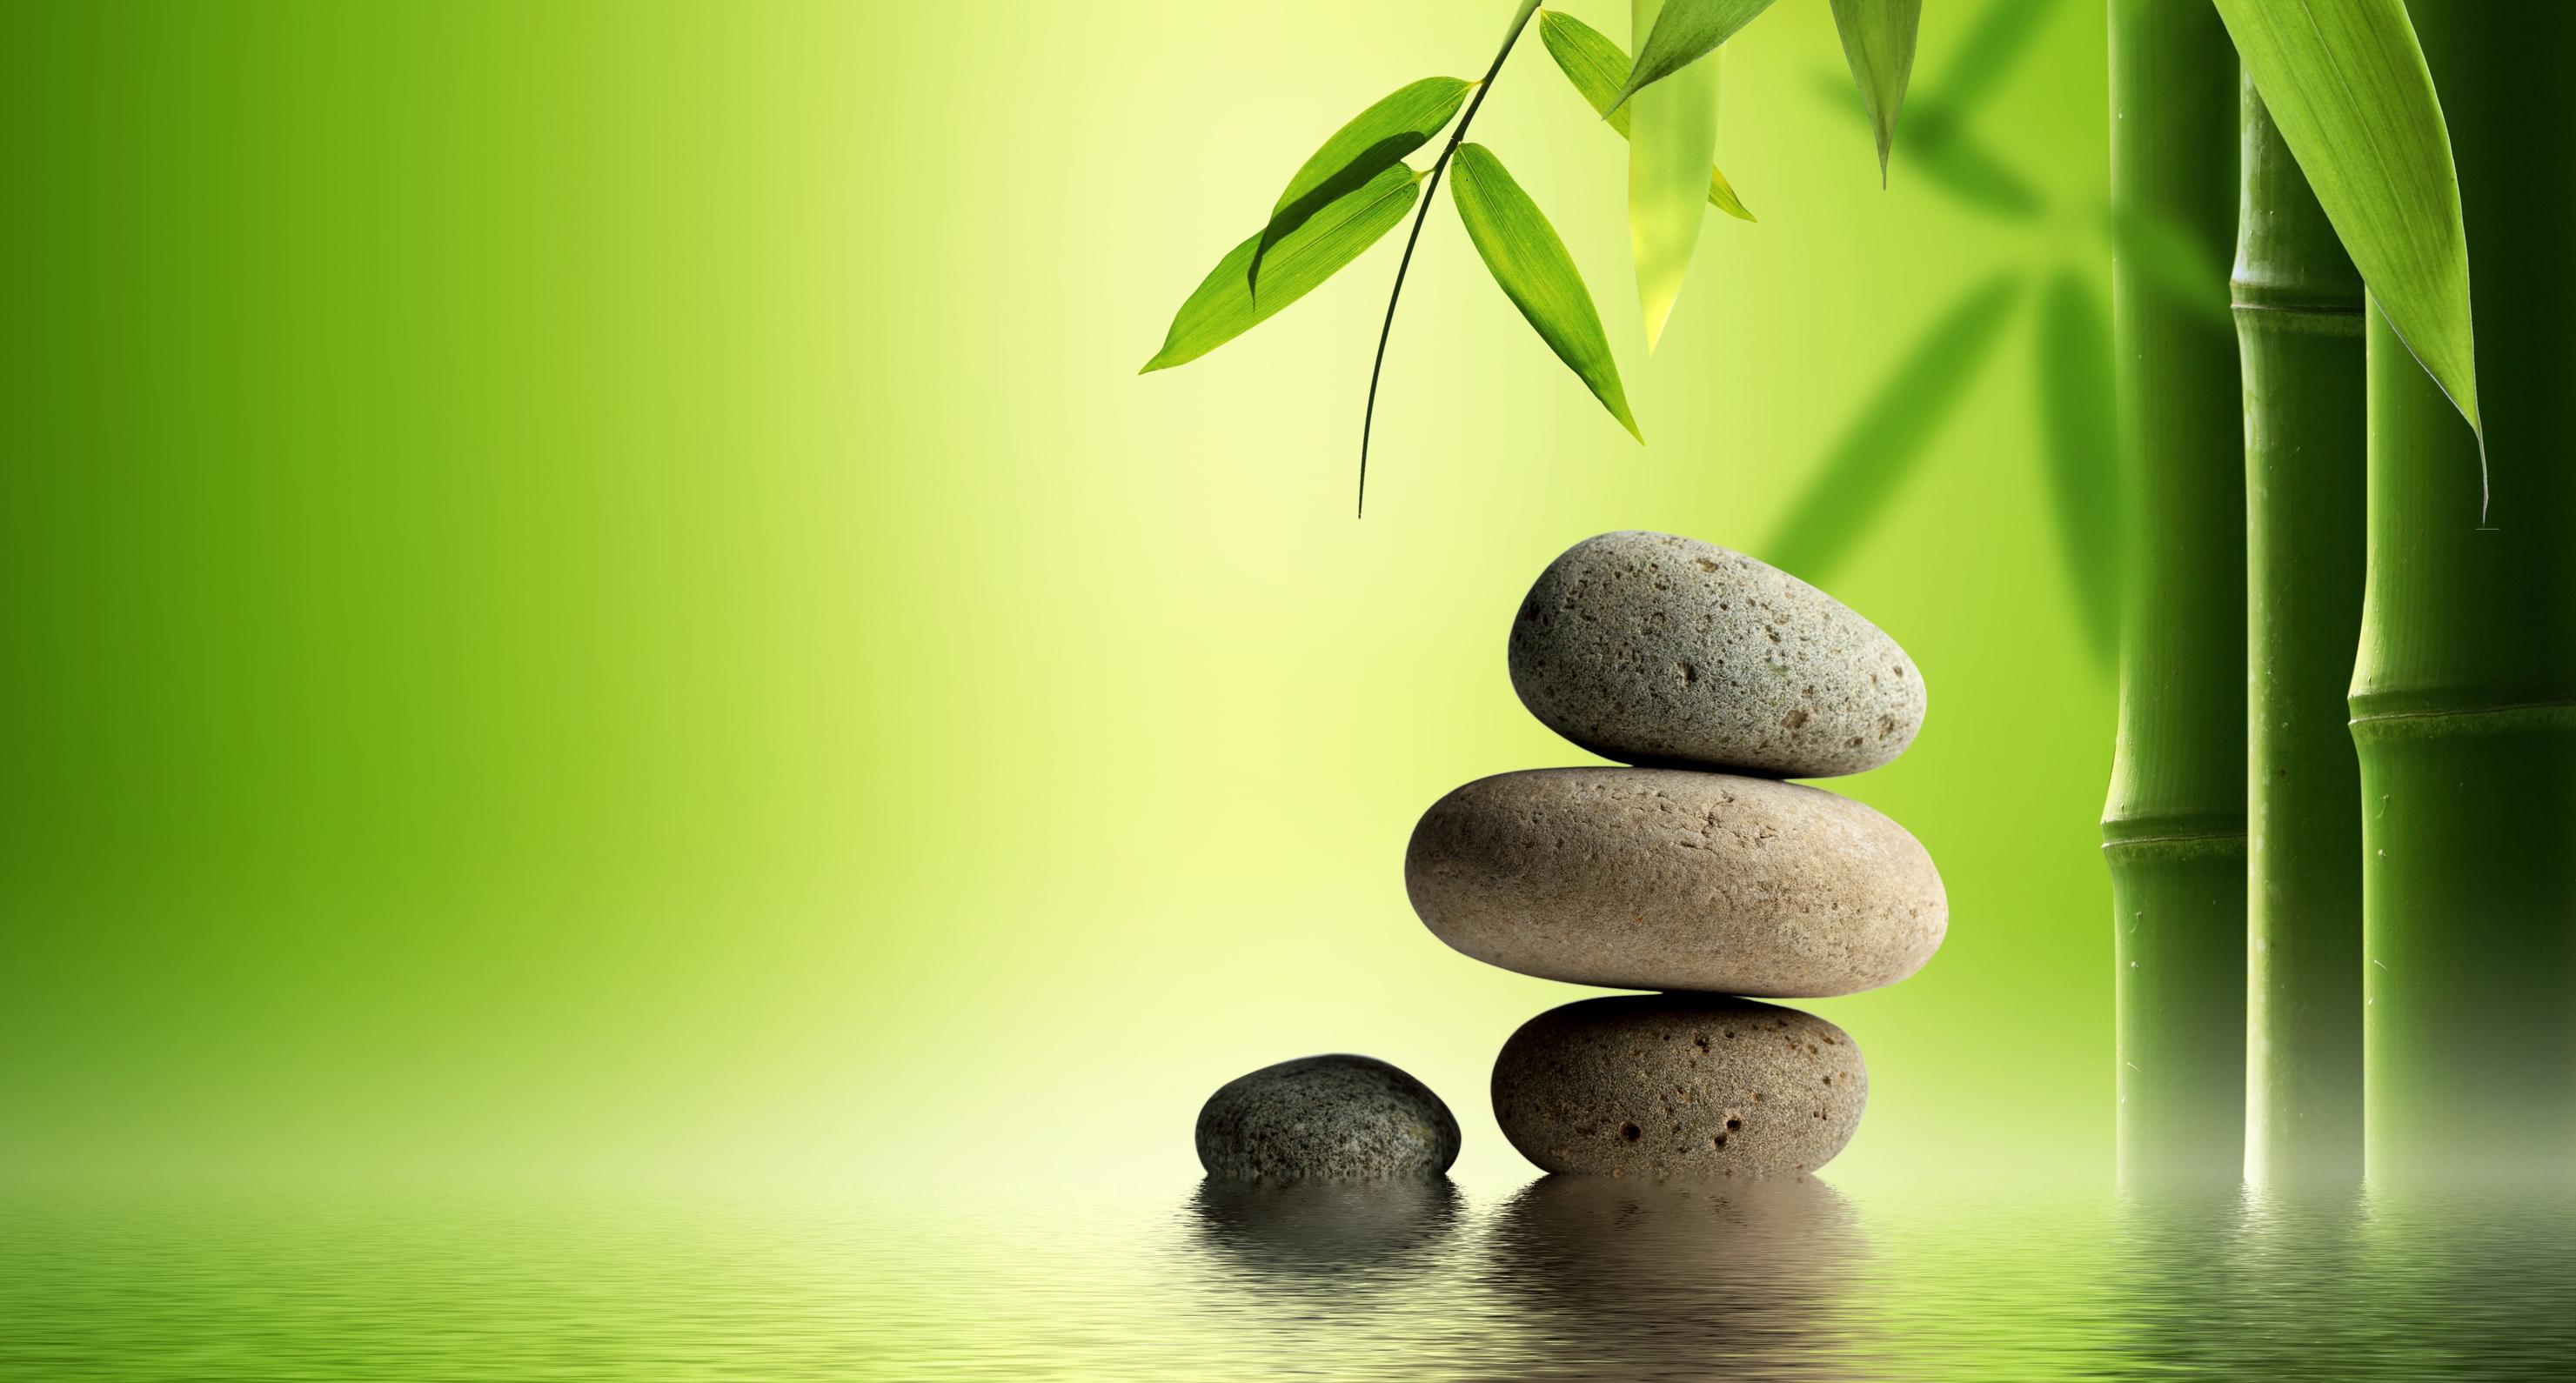 Lovingkindness Meditation Image